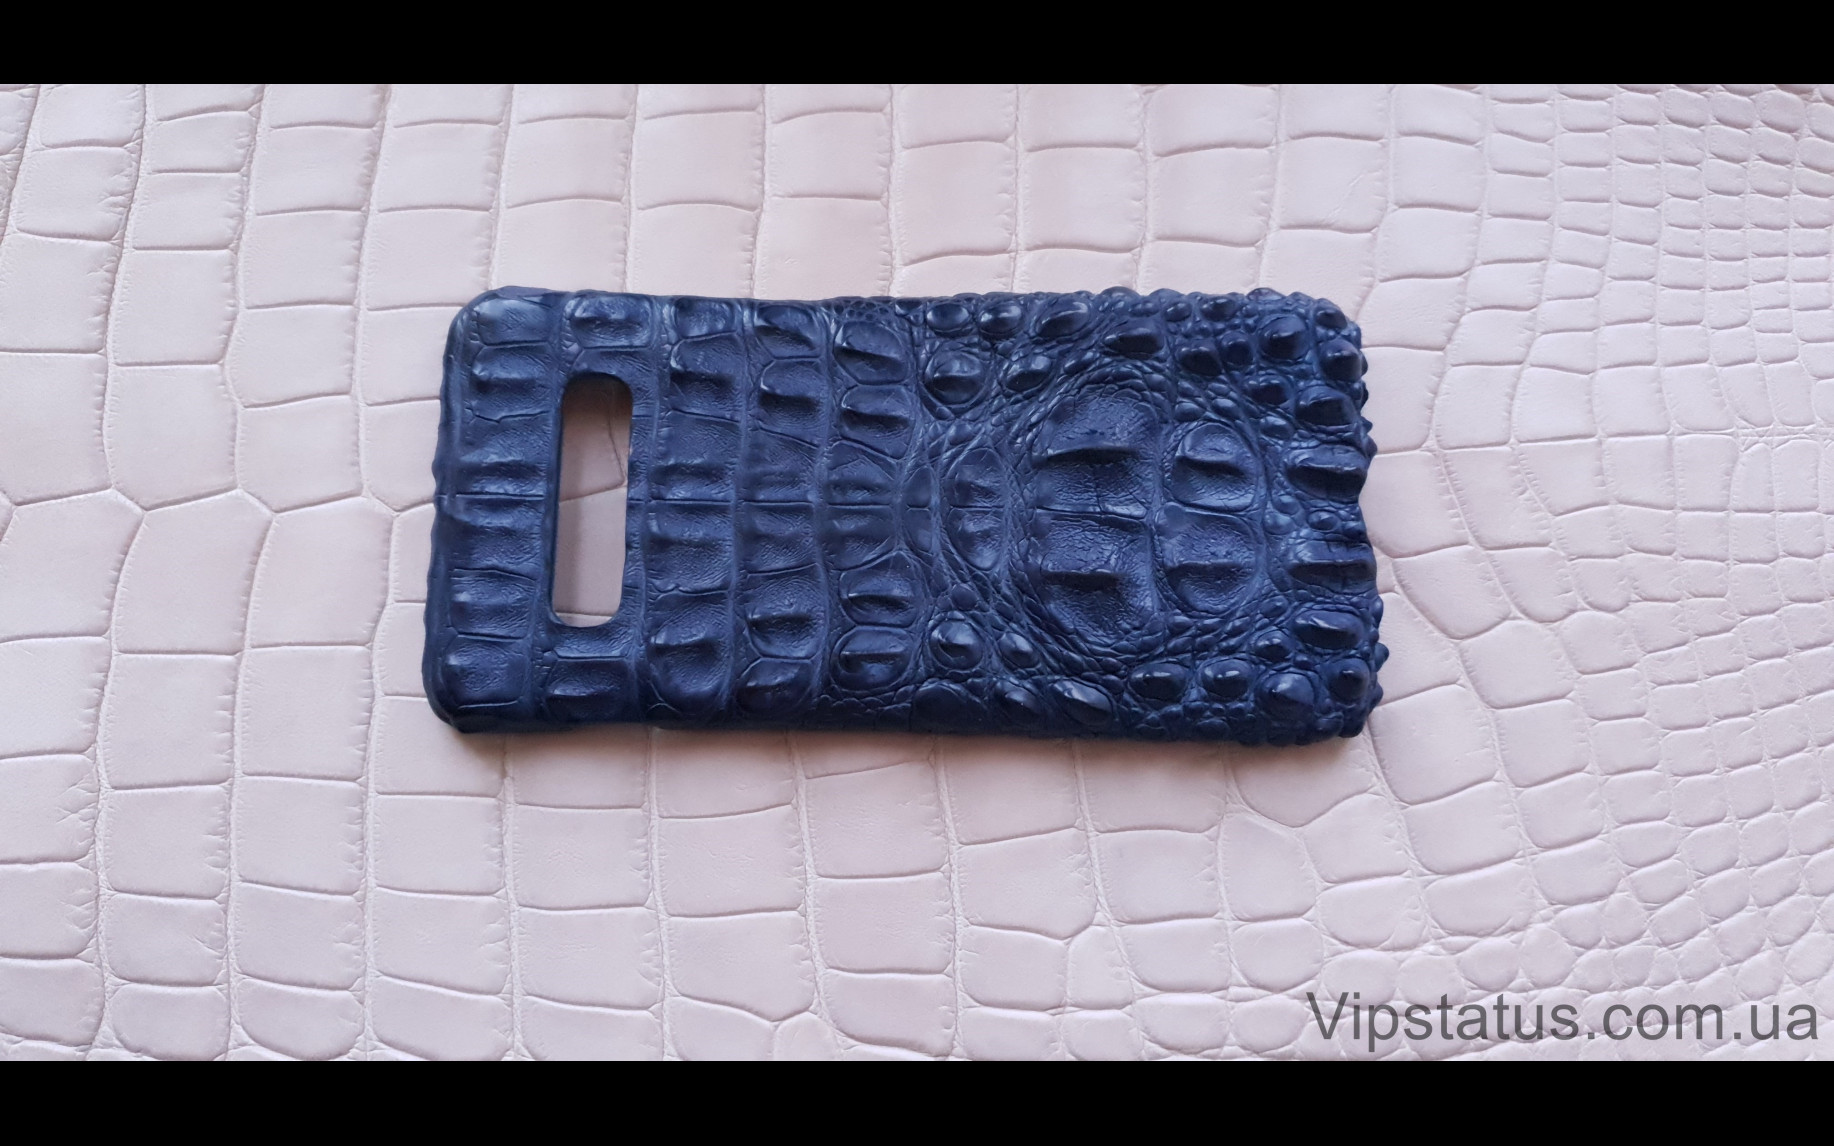 Elite Blue Crocodile Брутальный чехол Samsung S10 S20 S21 Plus Blue Crocodile Brutal case Samsung S10 S20 S21 Plus Crocodile leather image 4